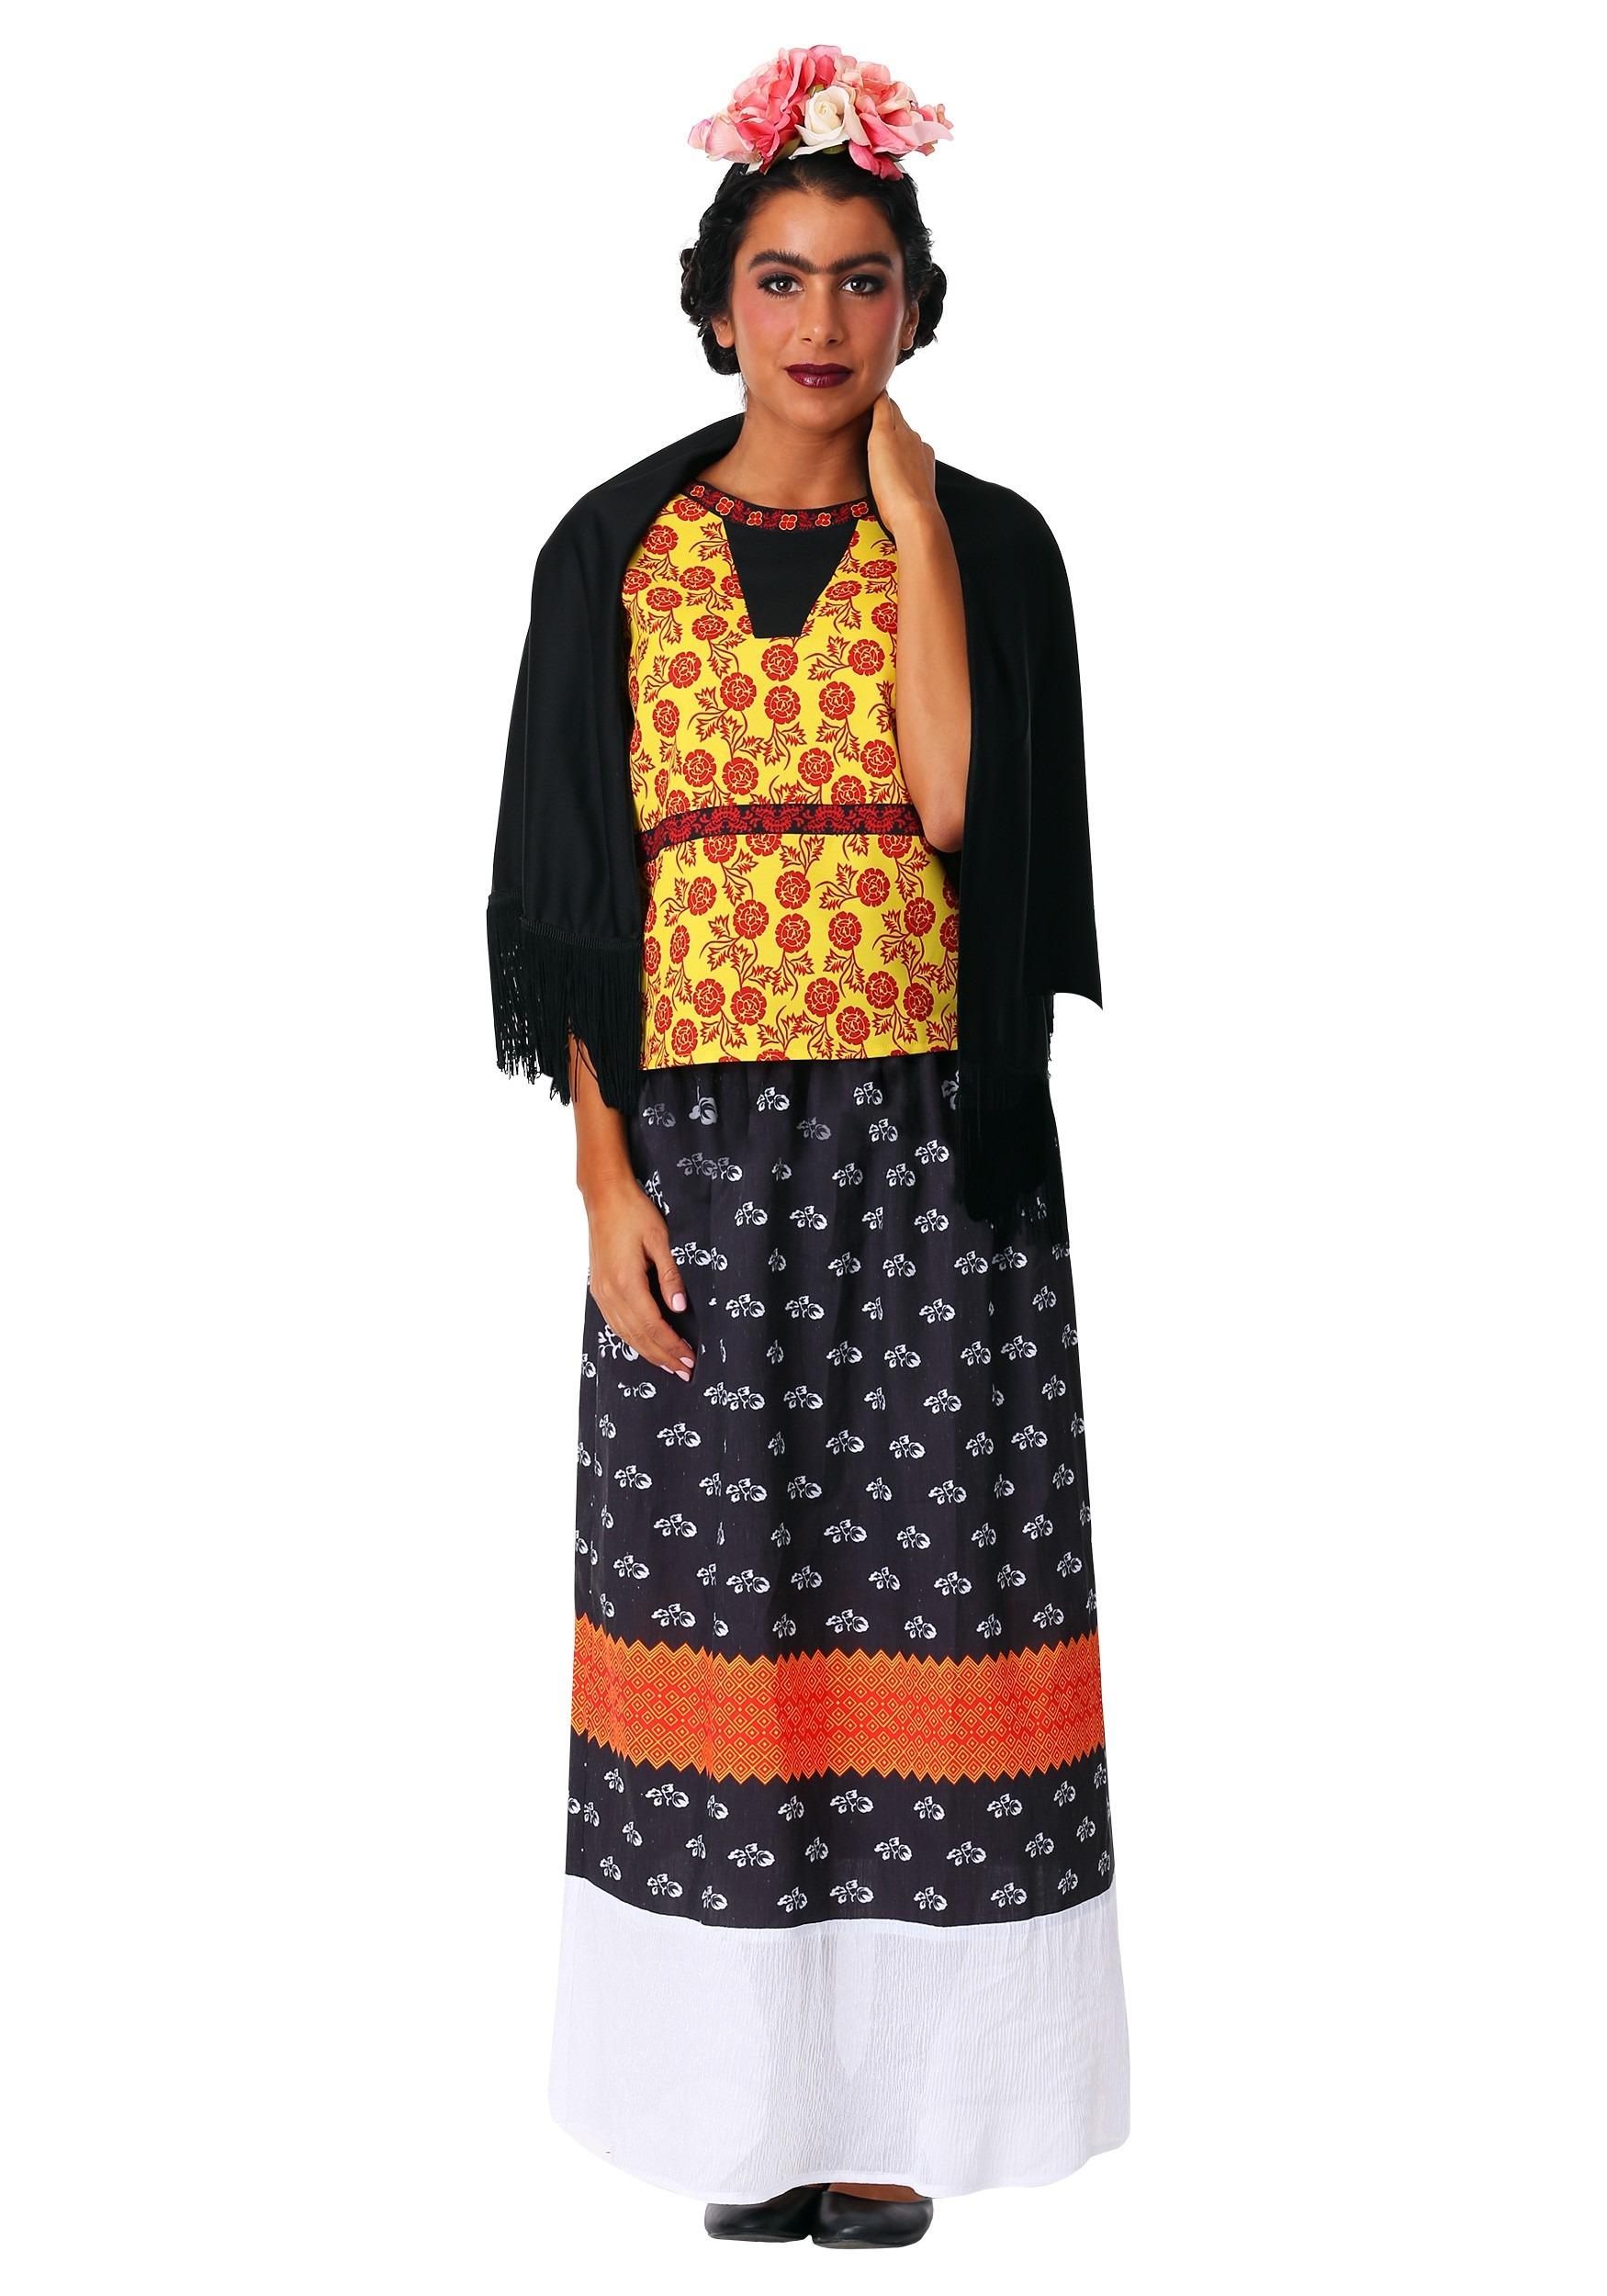 Womens Frida Kahlo Costume Dress